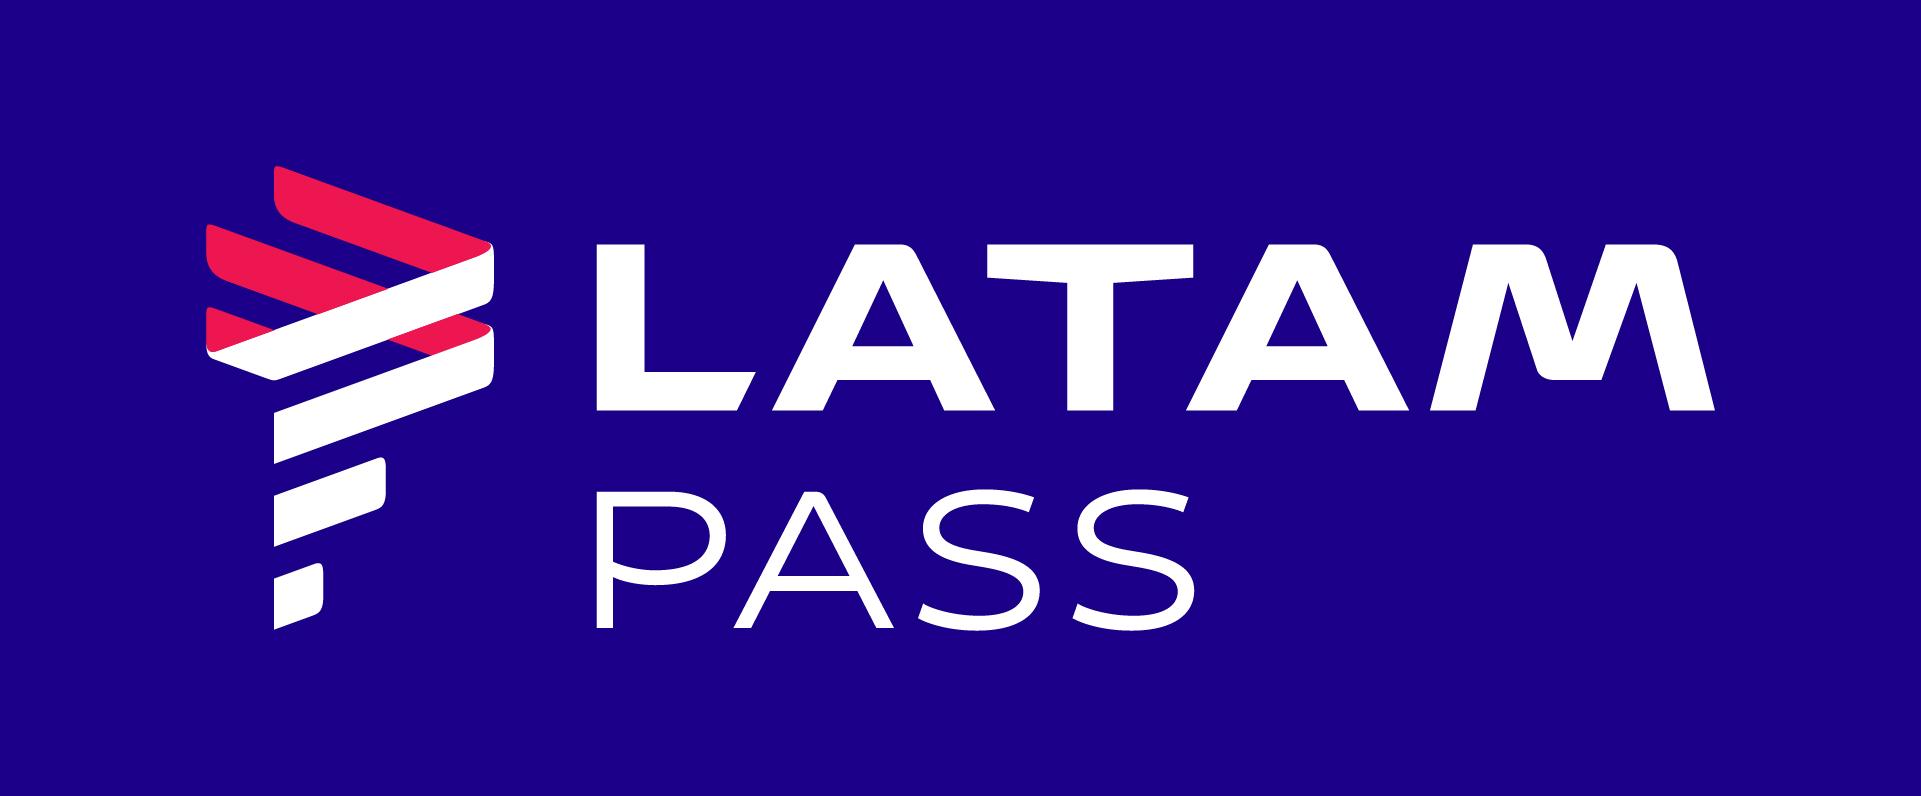 LATAM Pass negativo RGB